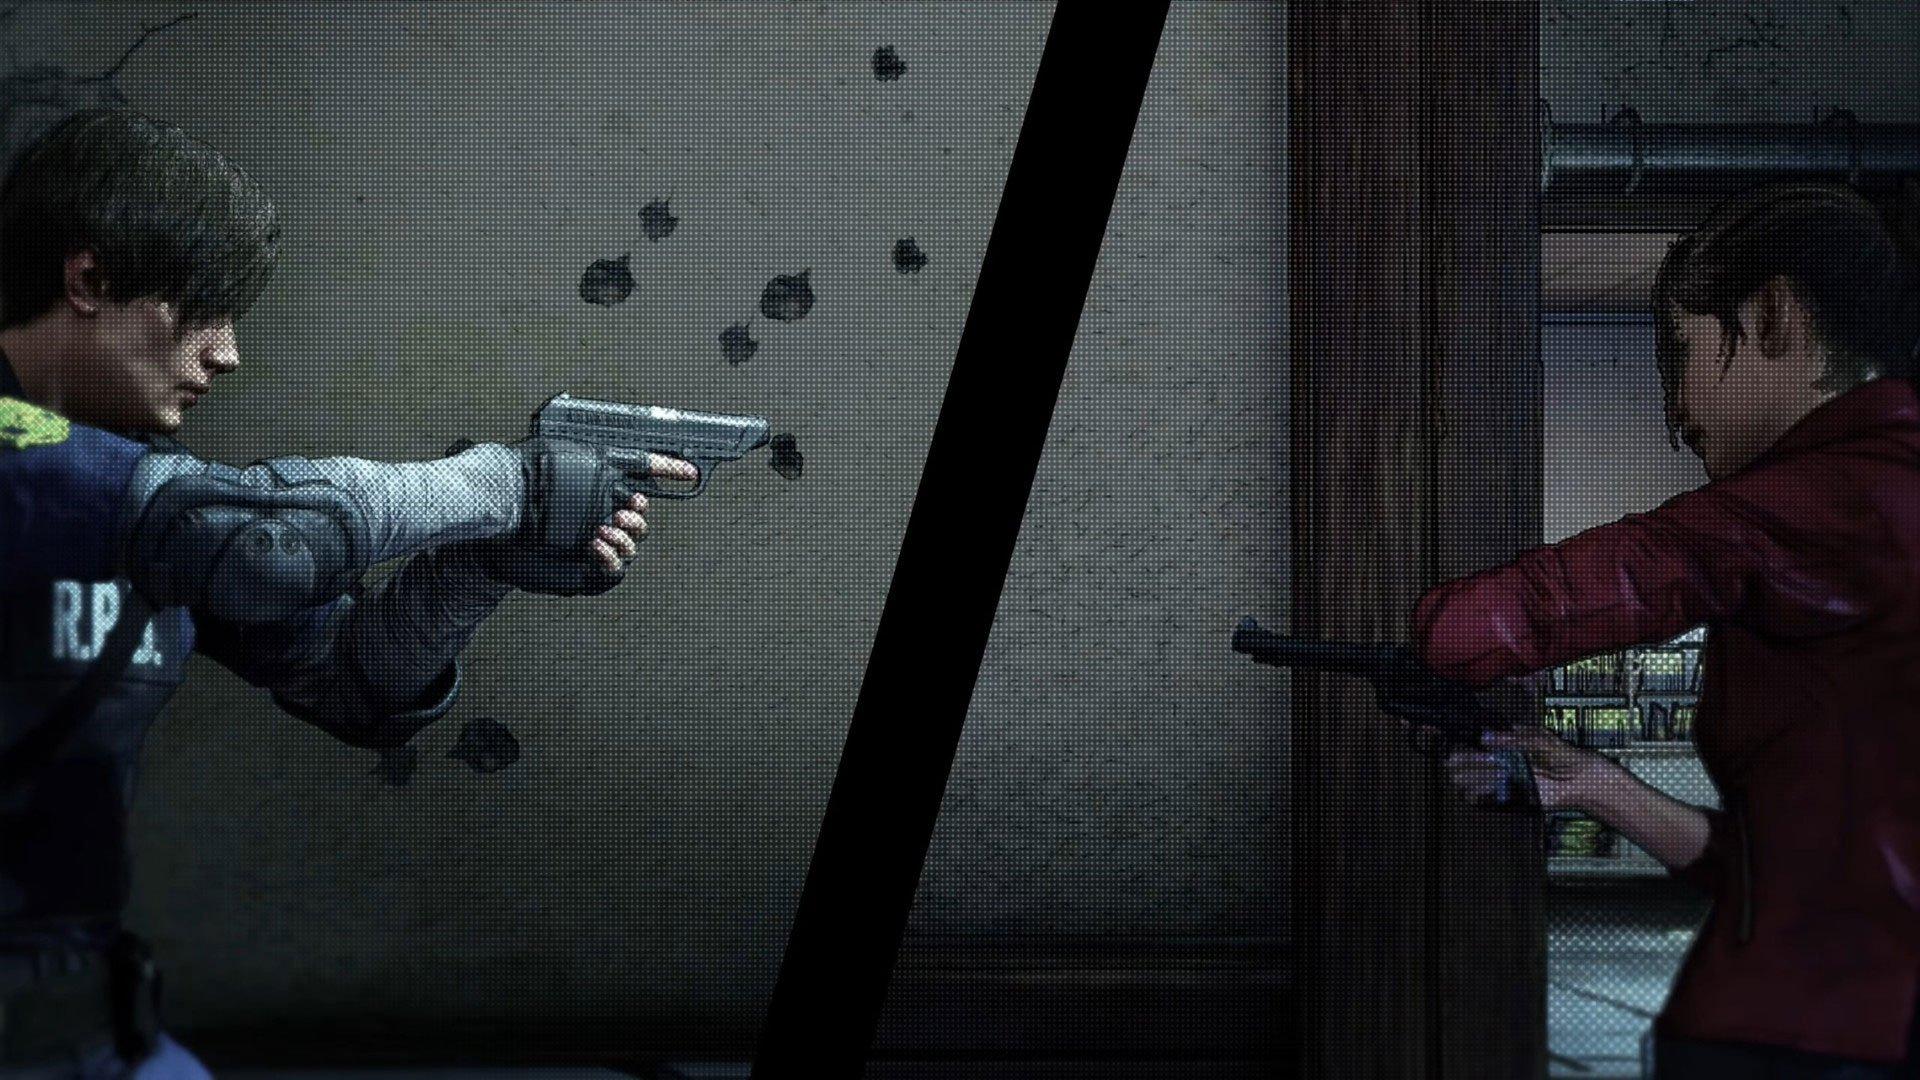 Resident Evil Re:Verse معرفی شد؛ یک بازی چند نفره با کاراکترهای رزیدنت ایول